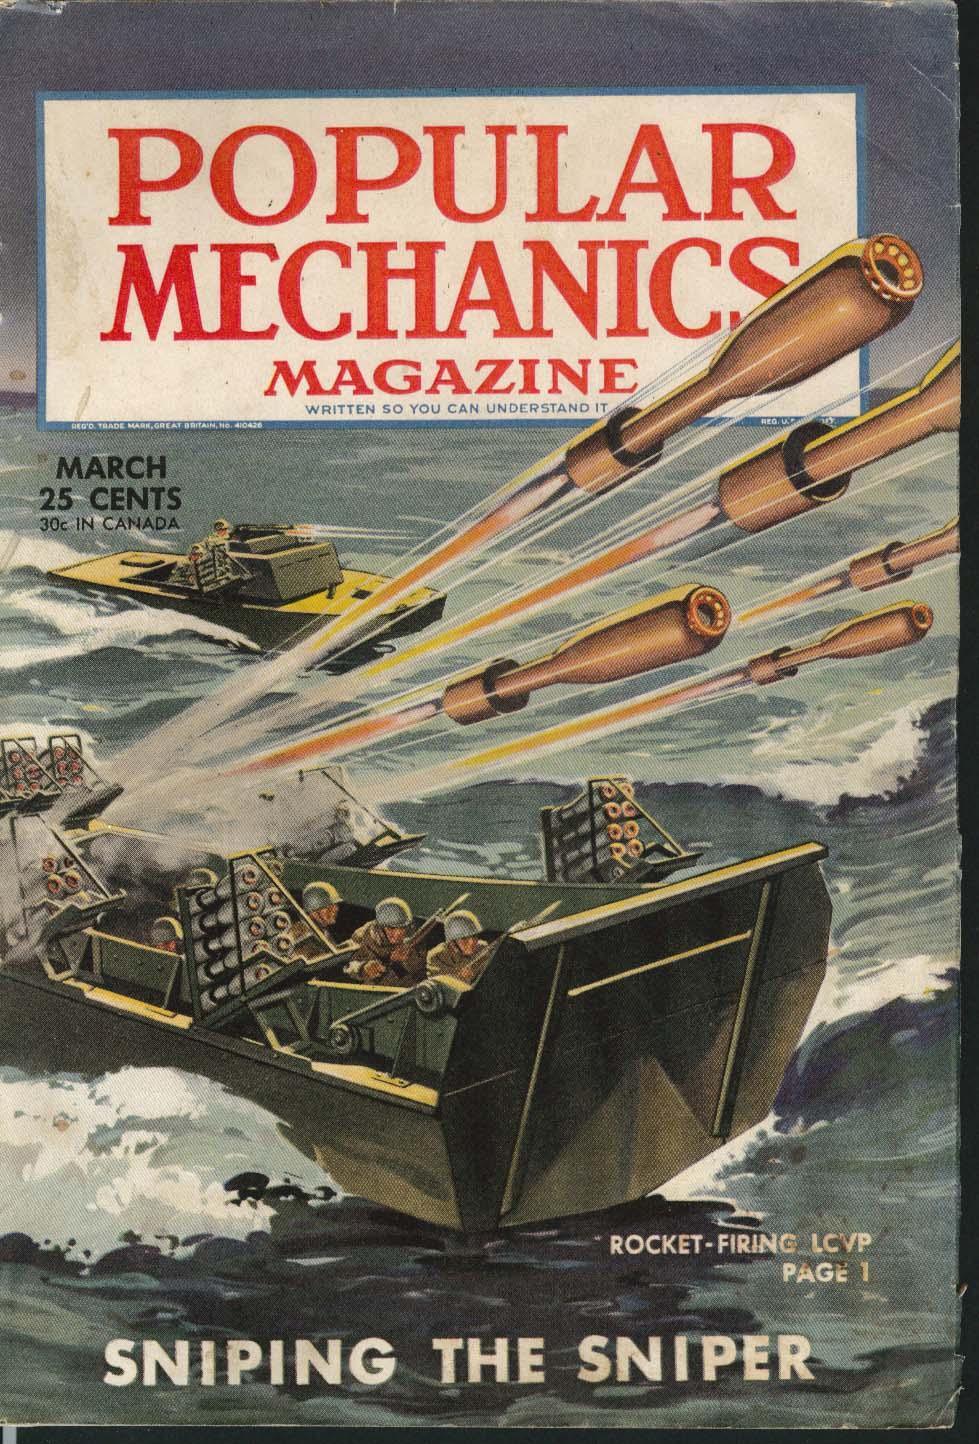 POPULAR MECHANICS Coast Guard Ice Crackers Bazooka Boats Black Gold ++ 3 1945